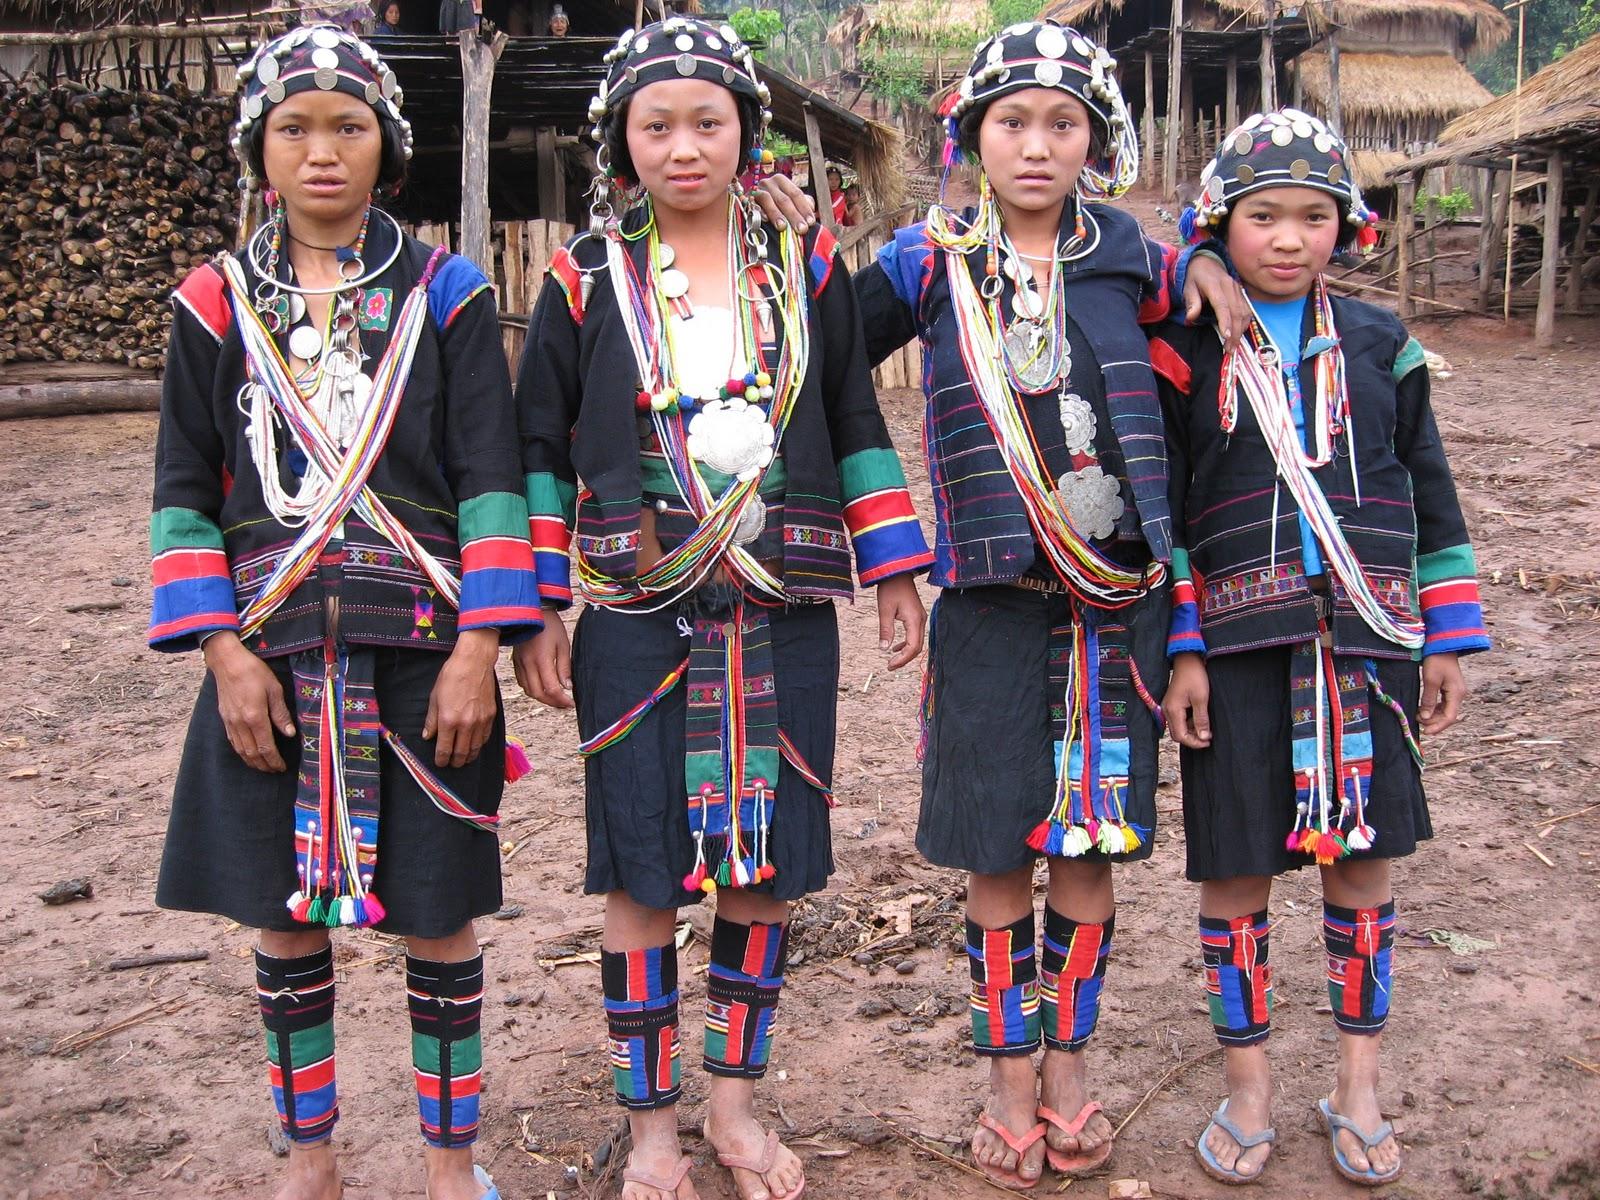 Kmu tribespeople.JPG